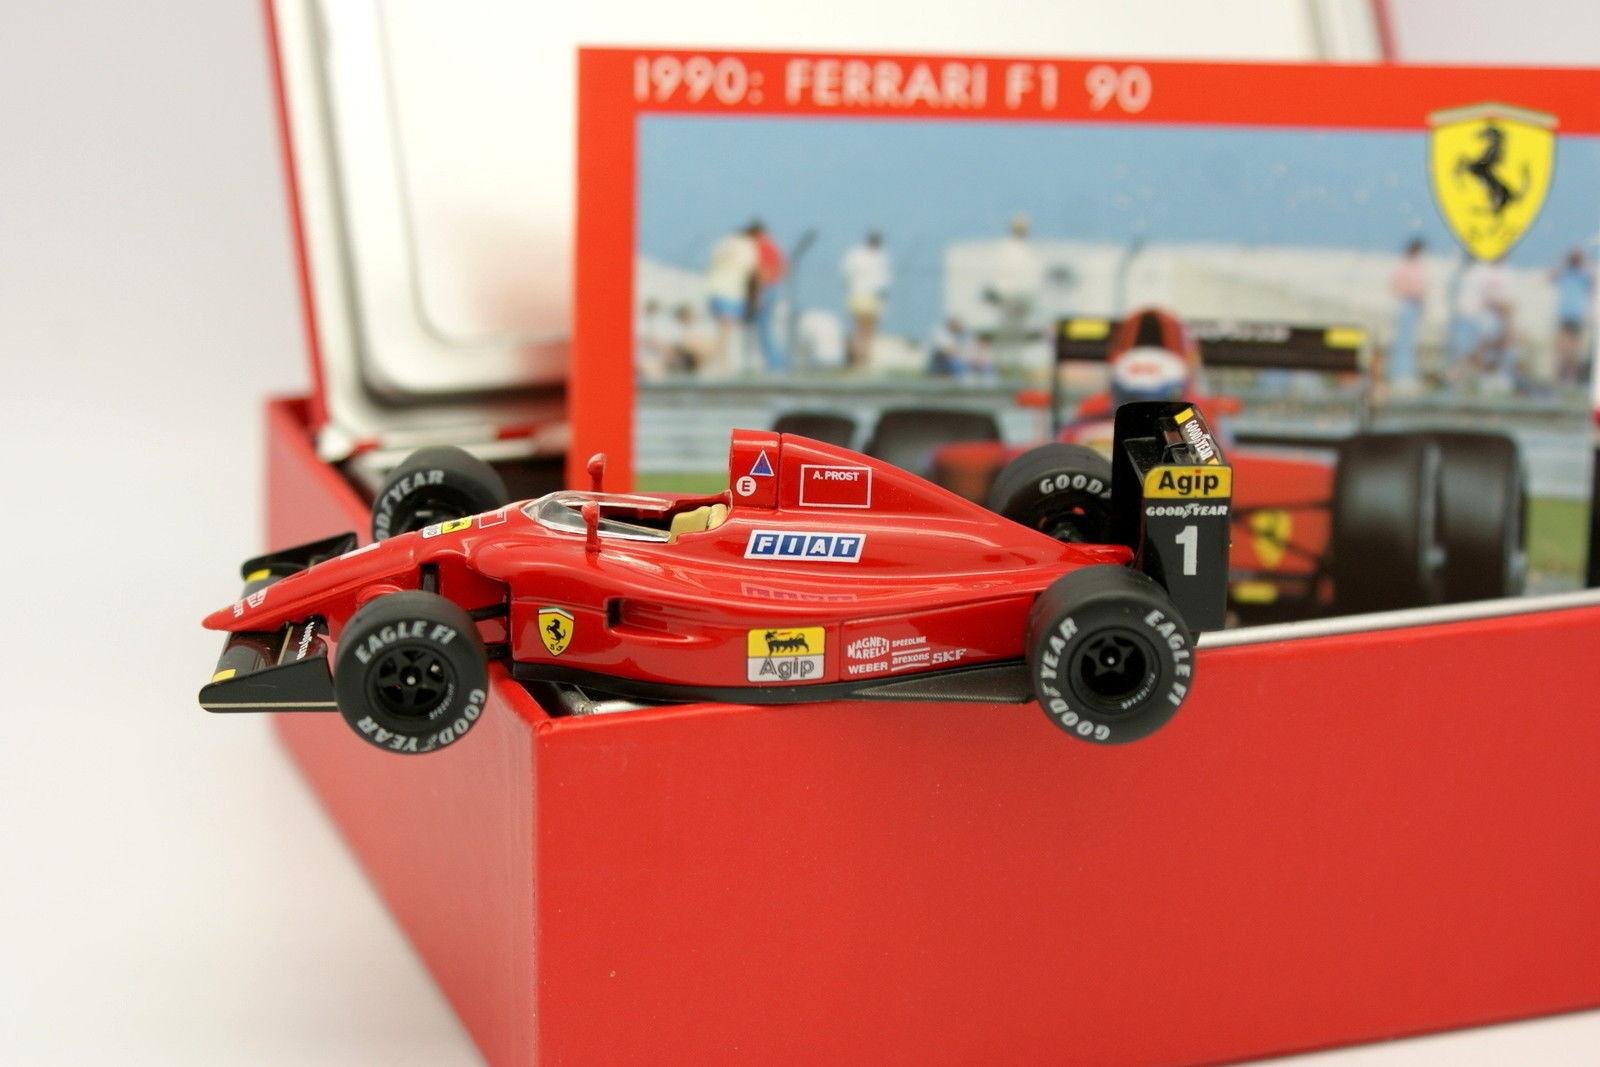 Hot Wheels 1 43 - Ferrari F1 641 90 French GP 1990 Prost